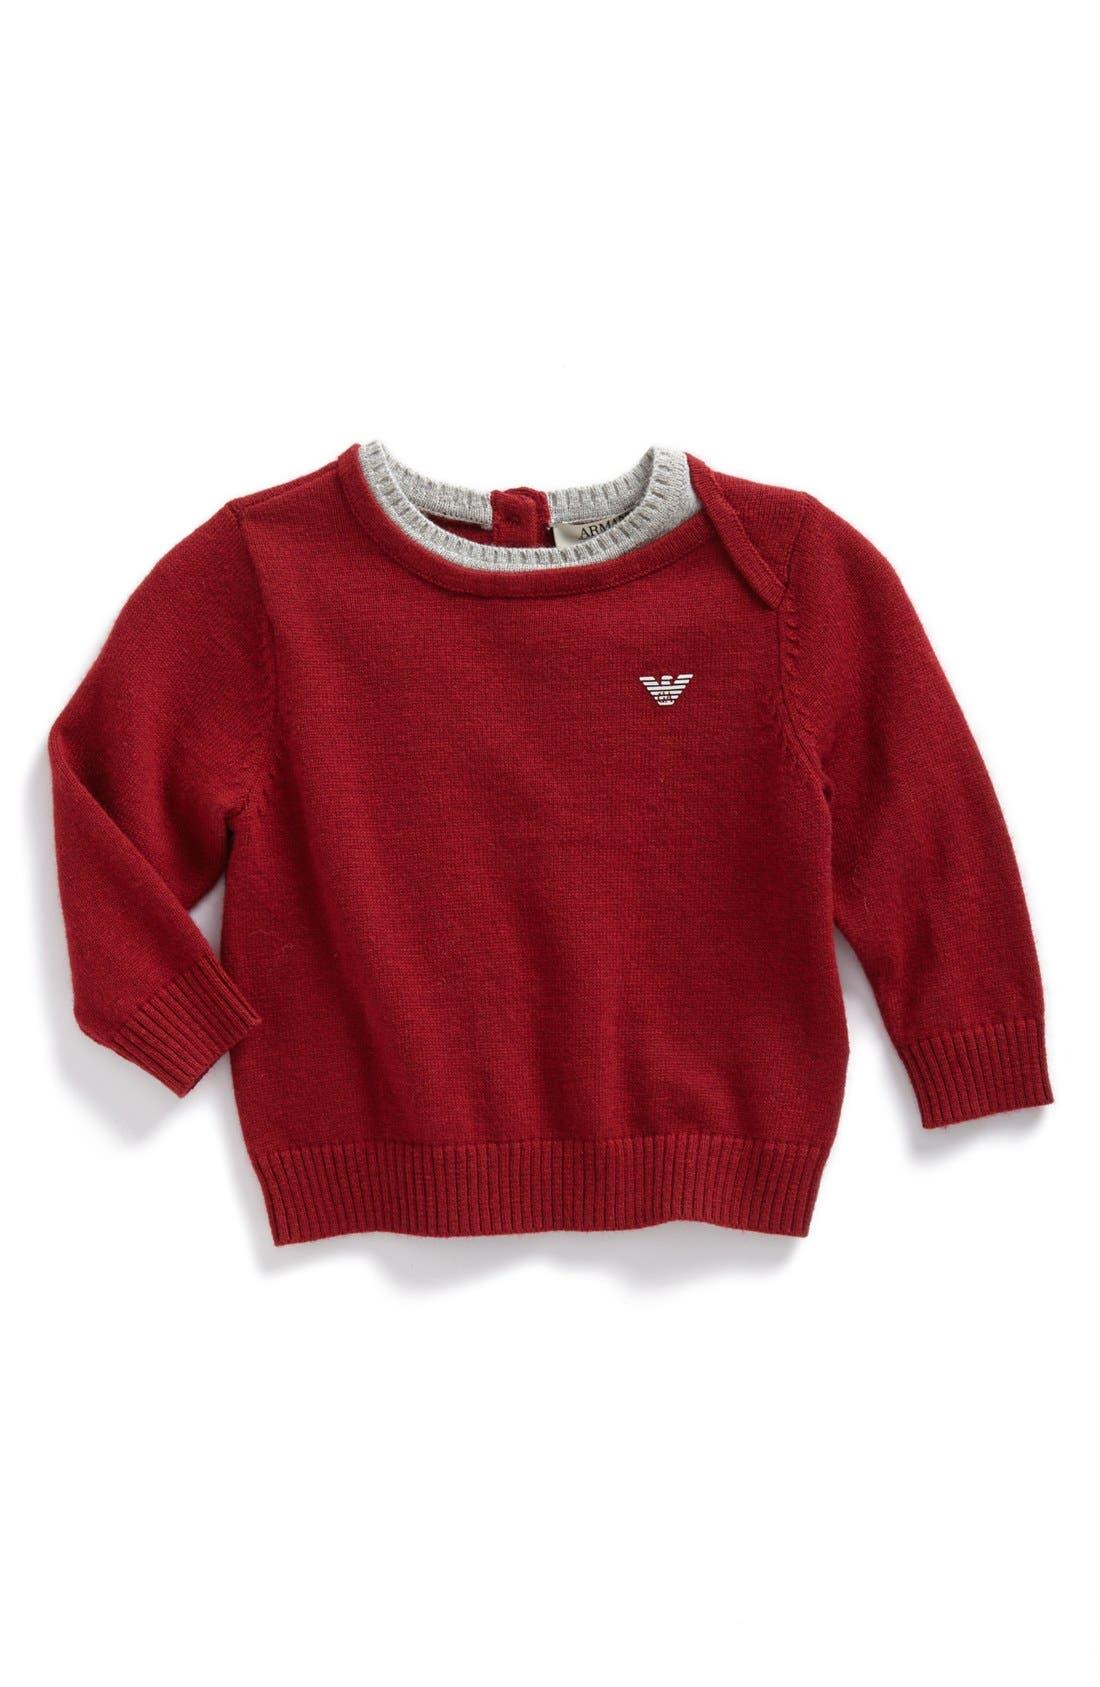 Main Image - Armani Junior Knit Sweater (Baby Boys)